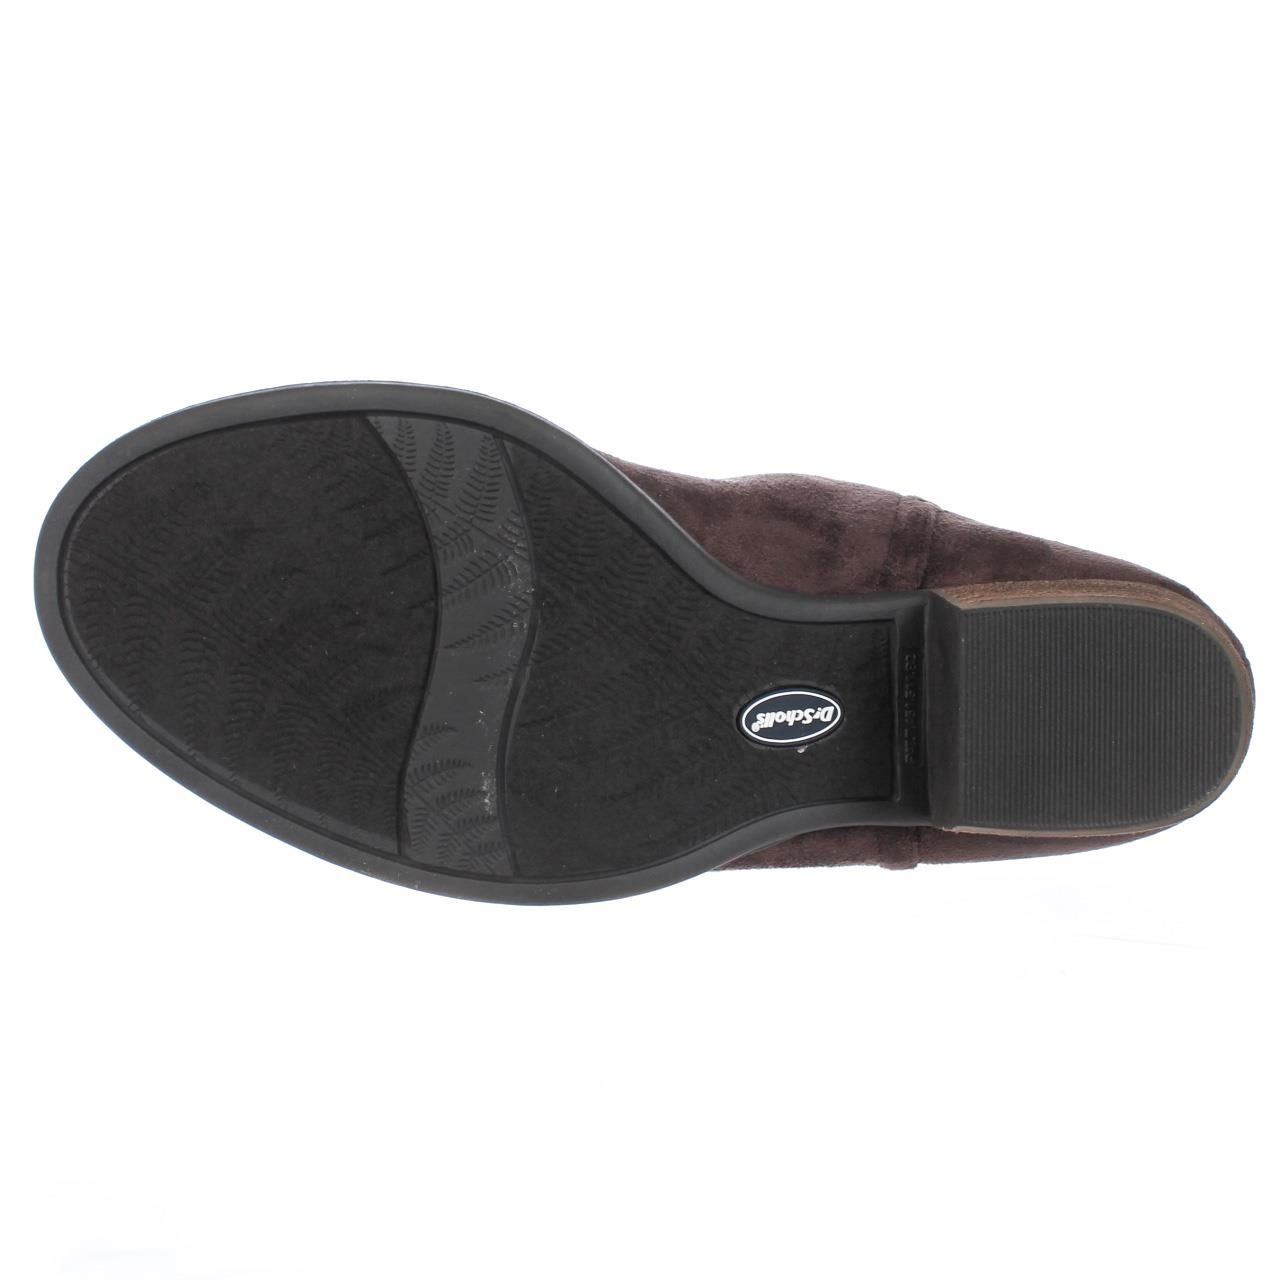 Womens Dr. Scholls Jorie Memory Foam Cool Fit Slip On Ankle Boots - Brown